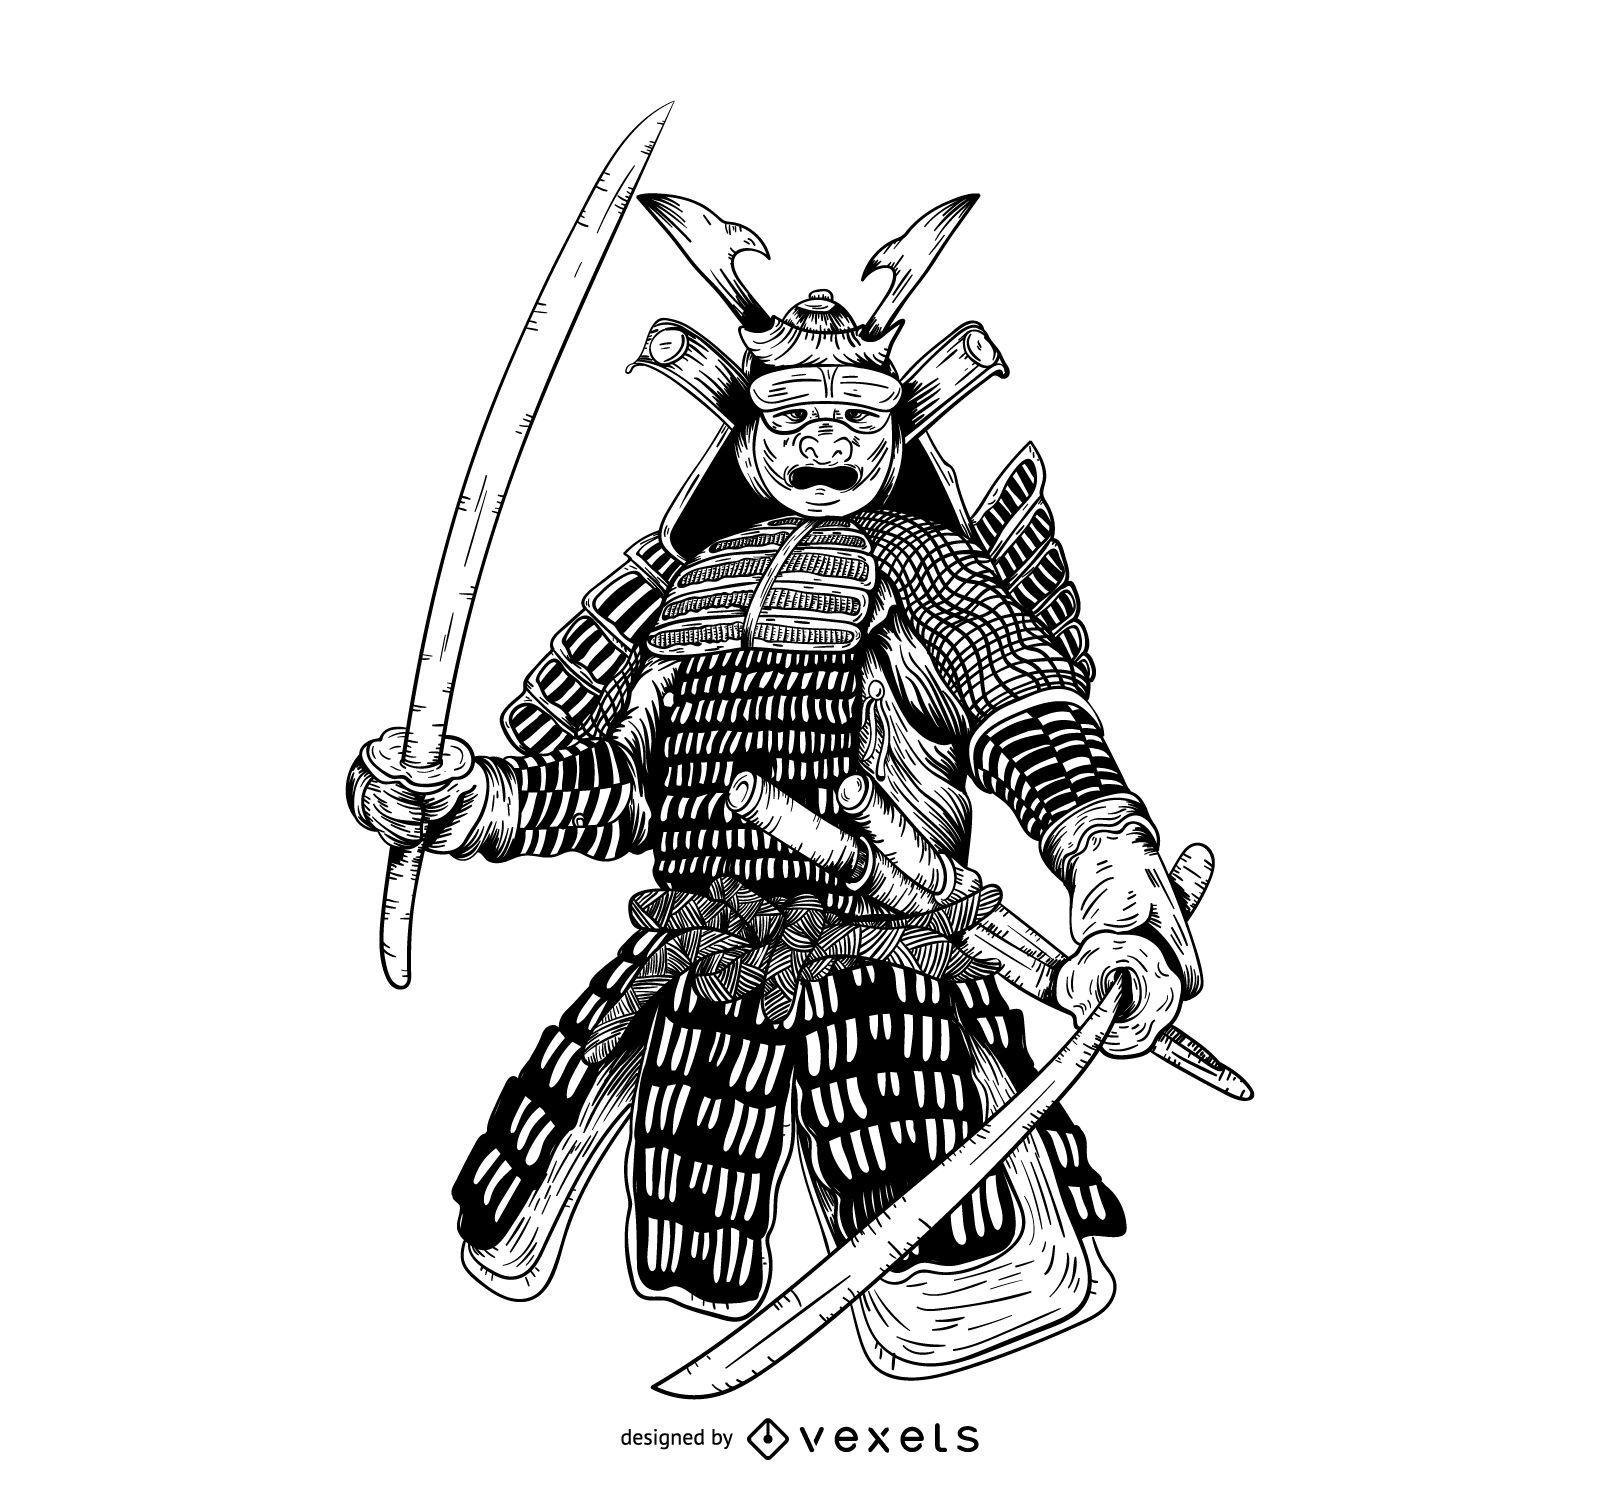 Ilustraci?n gr?fica dibujada a mano samurai